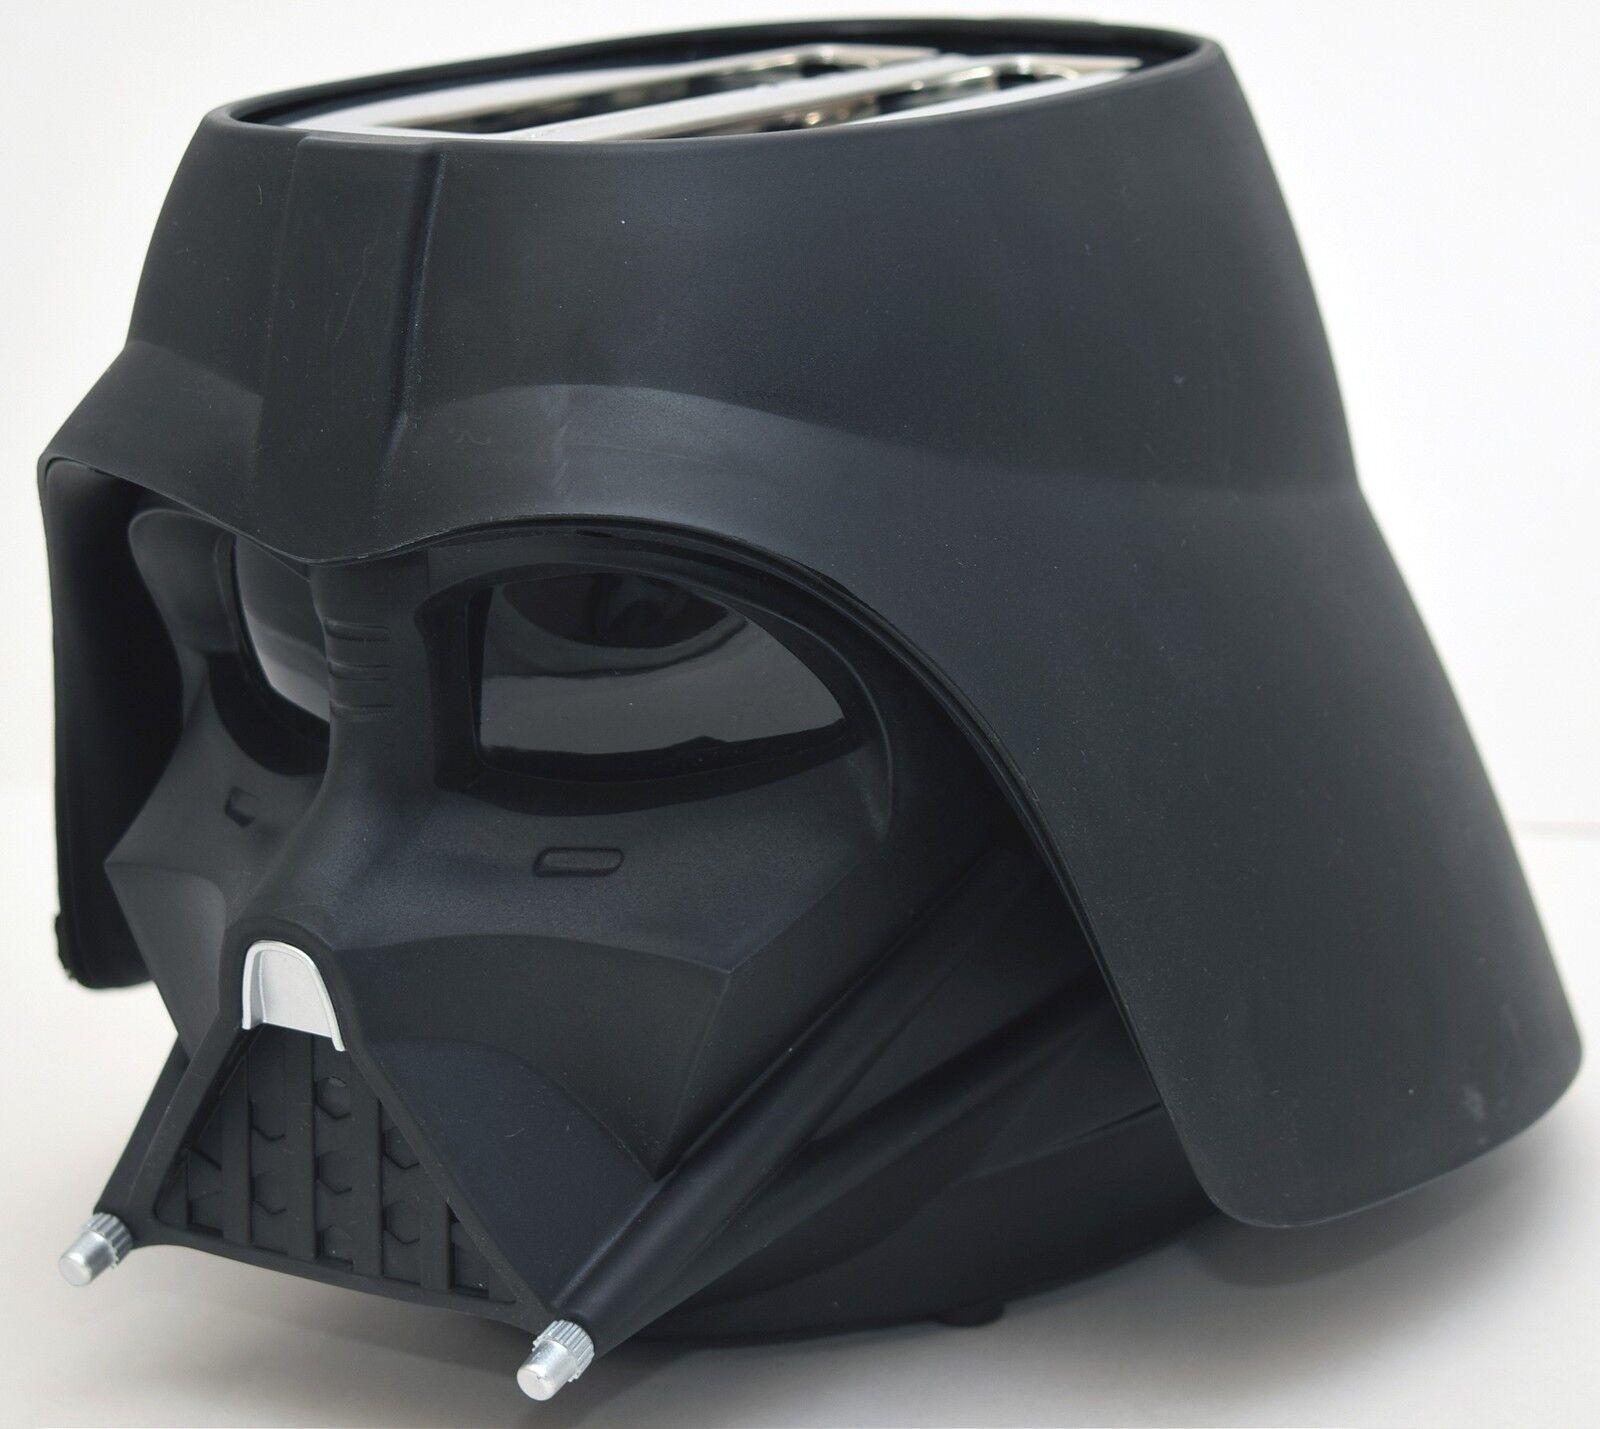 Official Star Wars Darth Vader Toaster Disney Helmet Kitchen 2 Slice